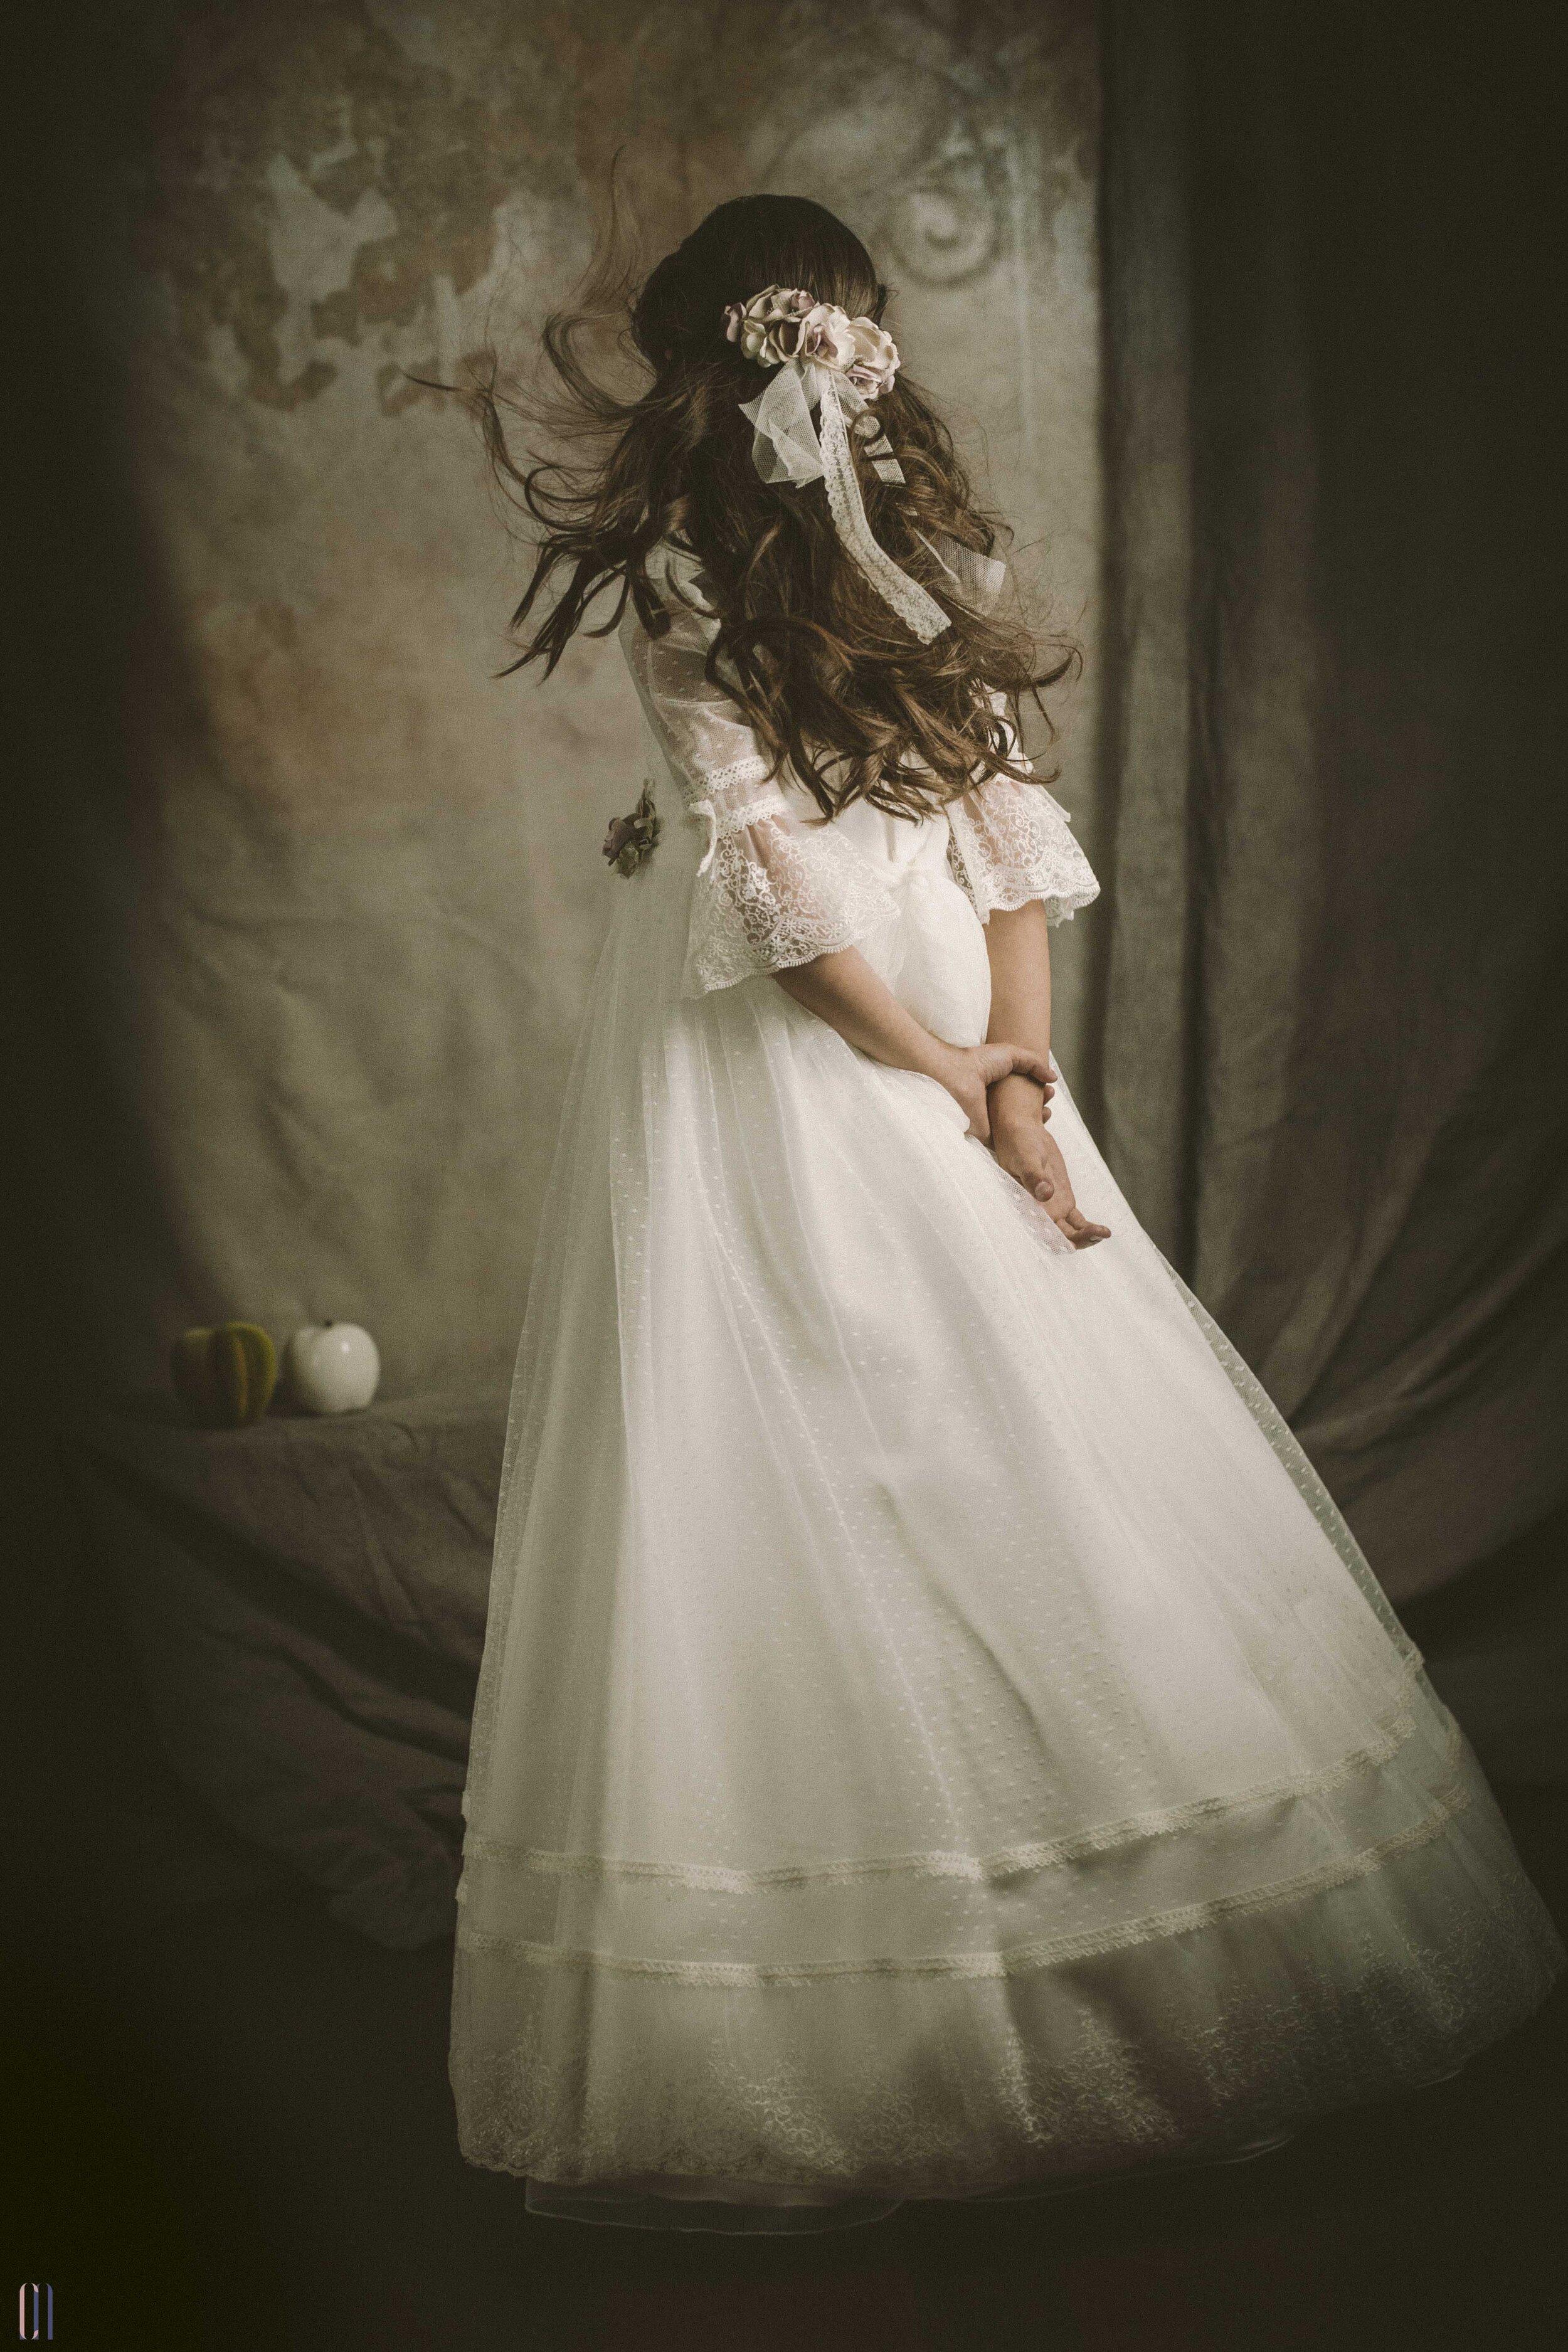 alejandra vestida de comunion-1-2.jpg